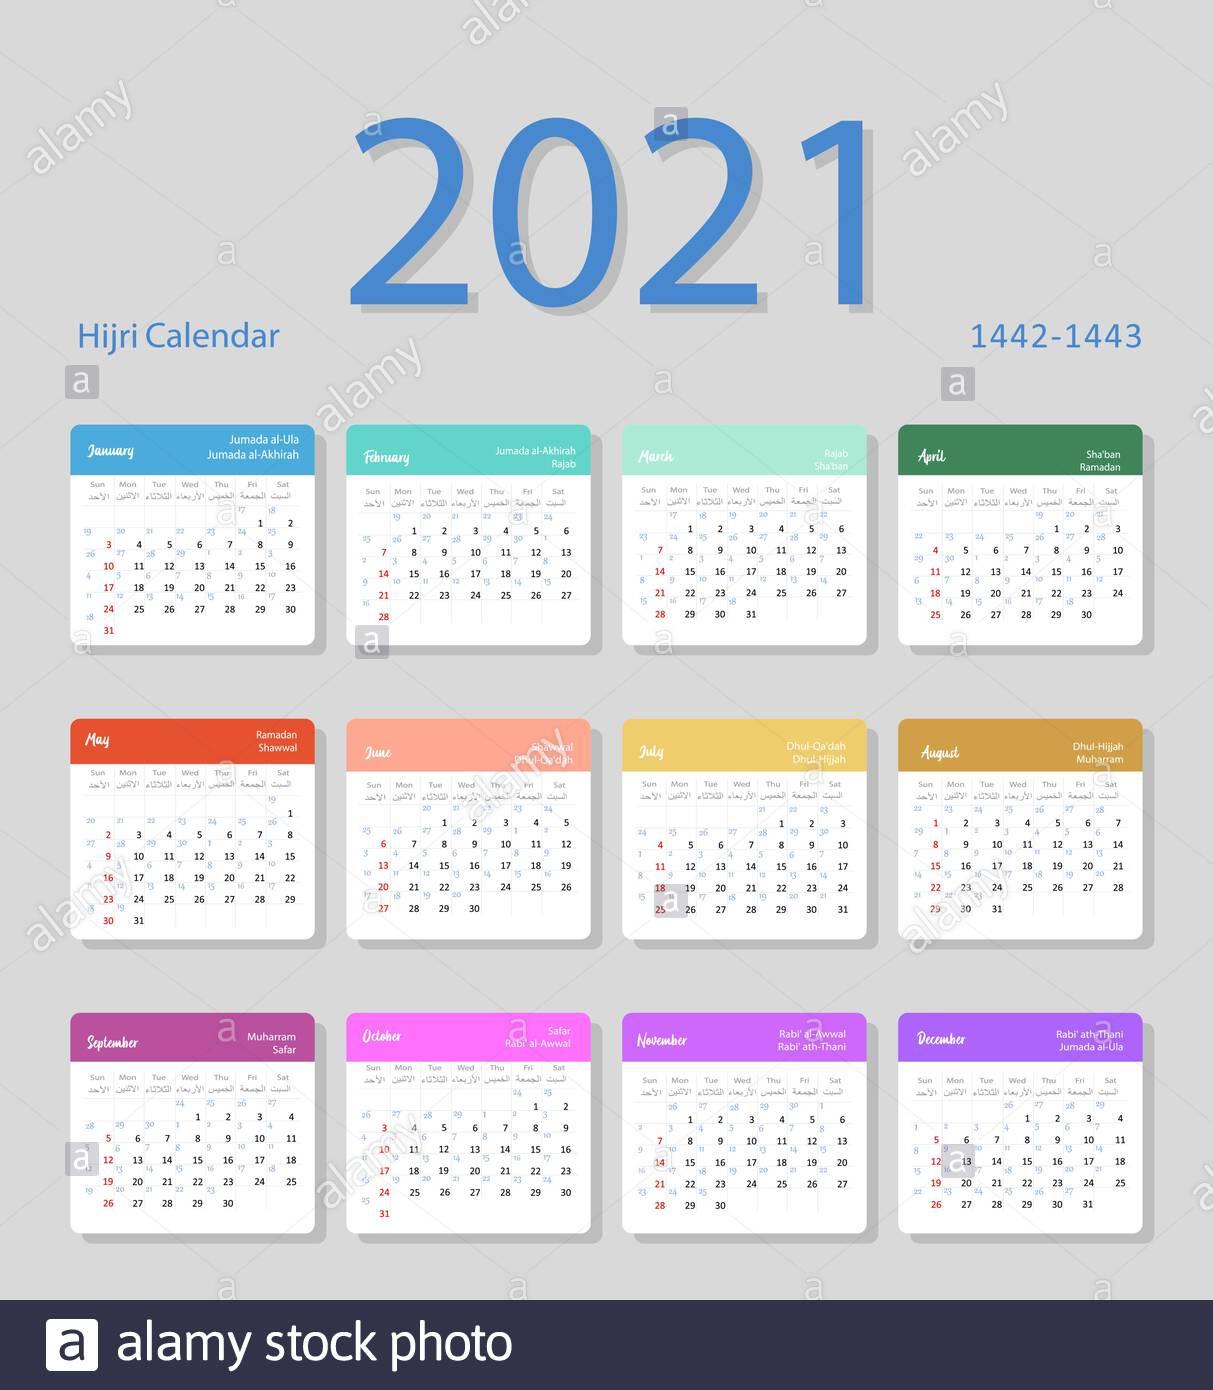 47+ Next Year Islamic Calendar 2021 Background December 2021 Islamic Calendar